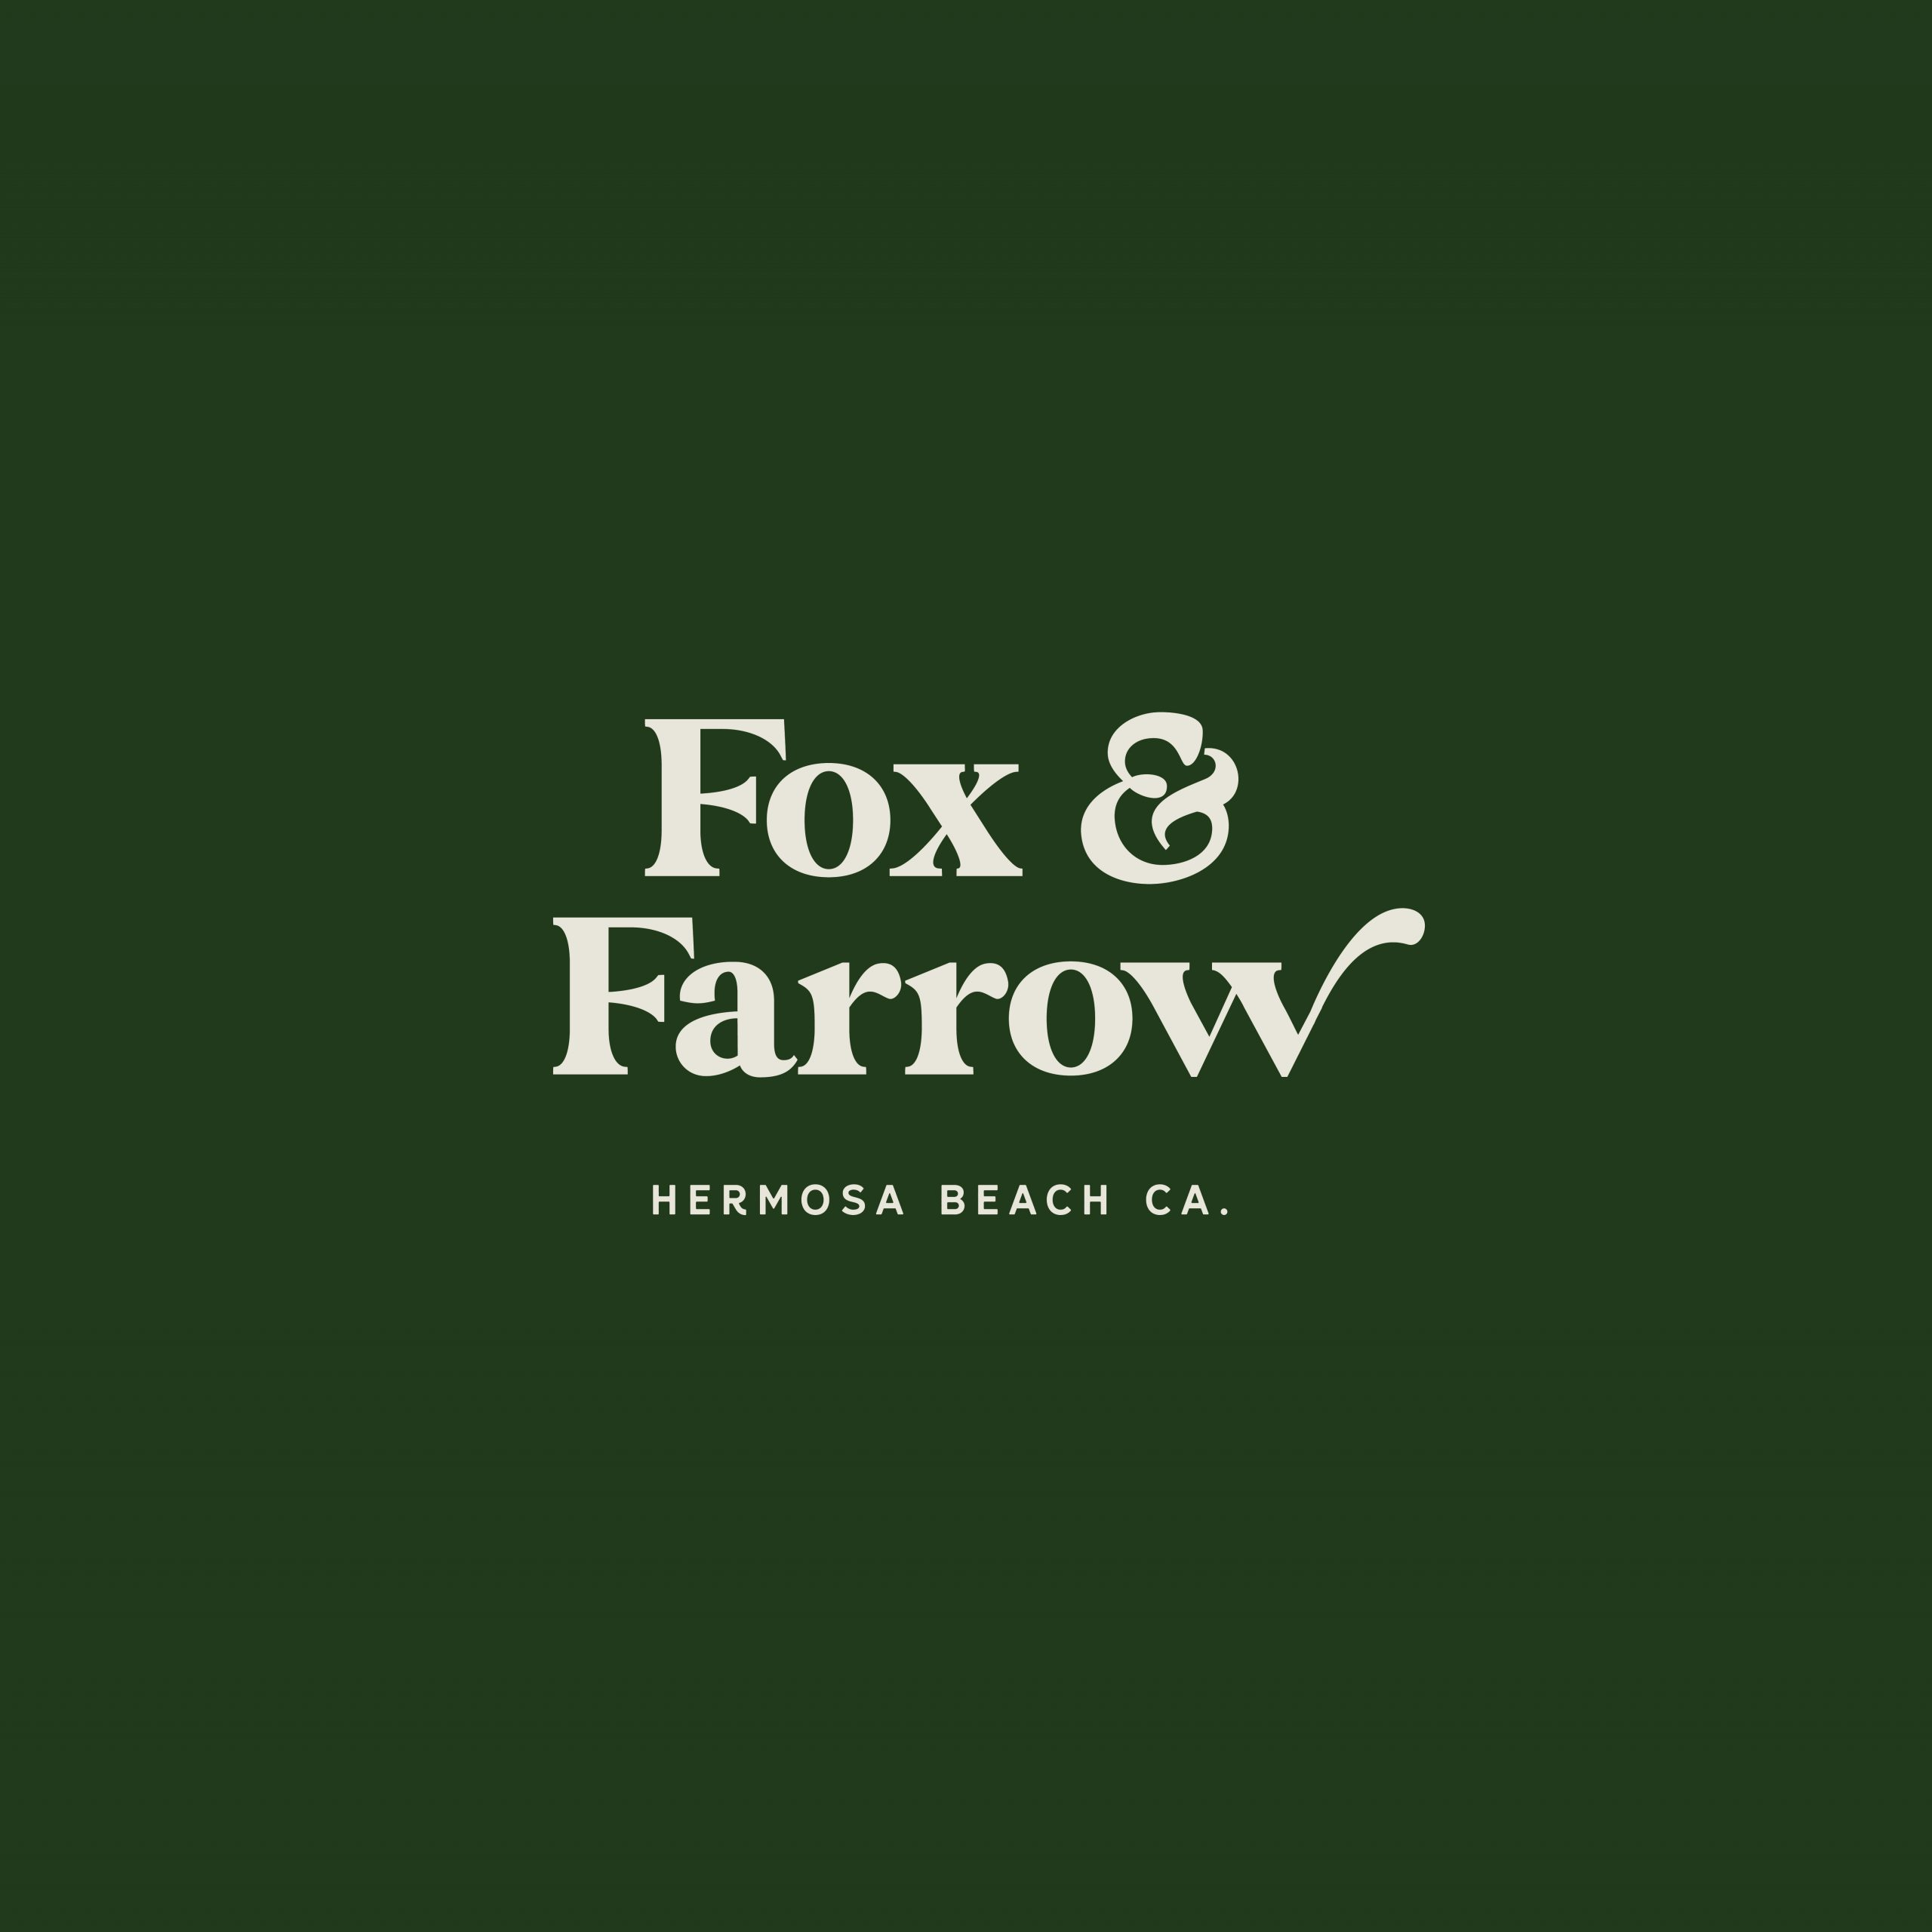 Stellen_Design_Fox_Farrow_Resturant_Branding_Logo_Design-05